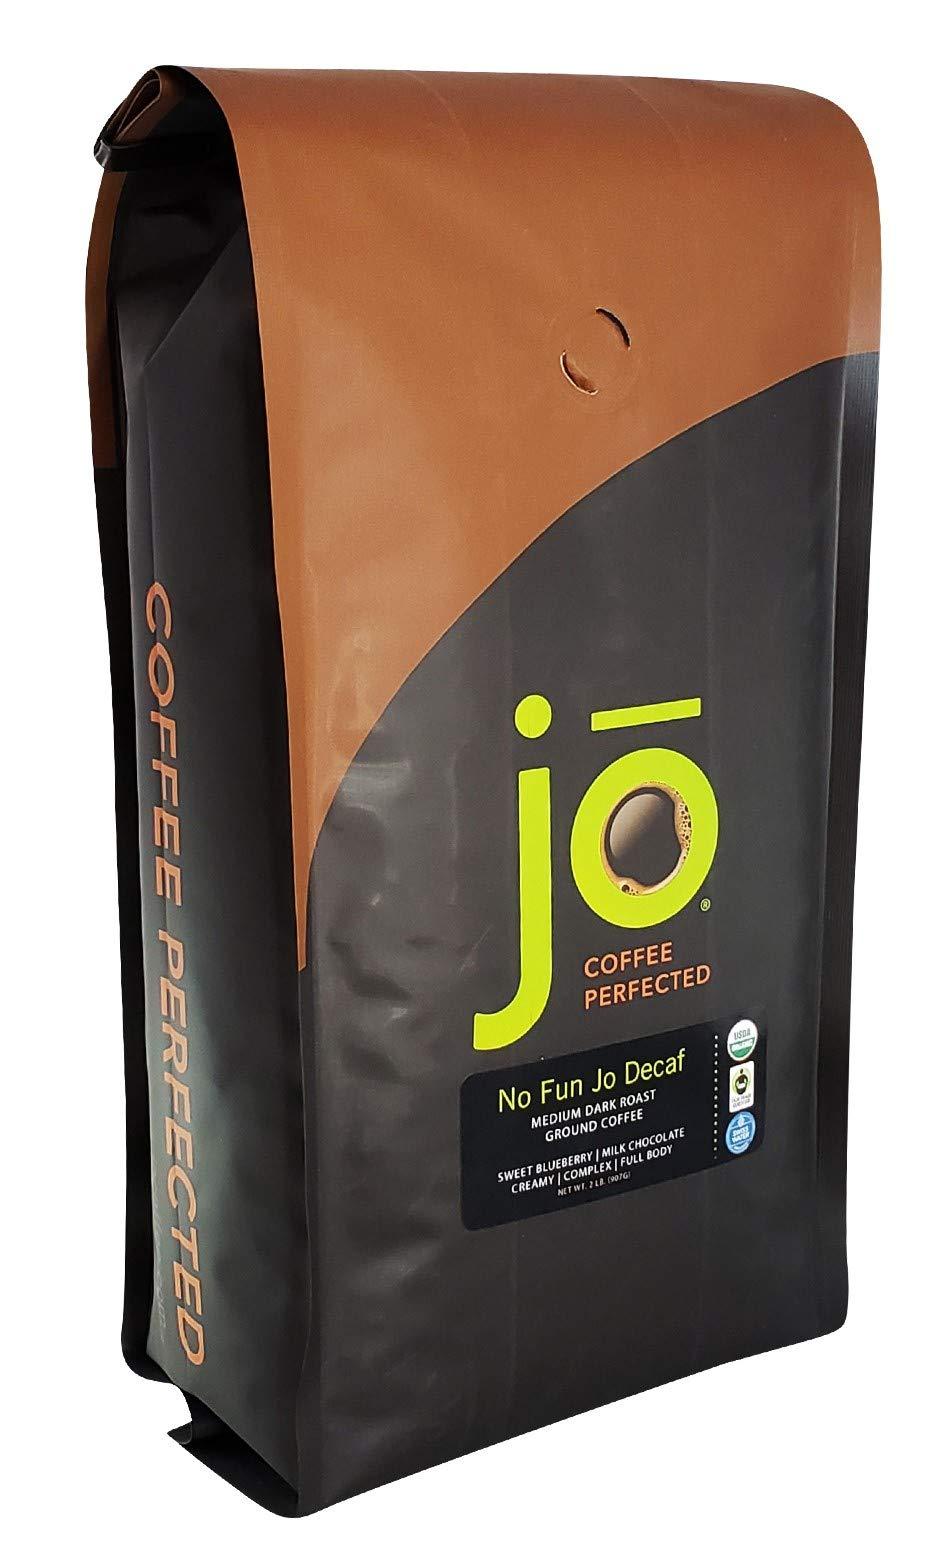 NO FUN JO DECAF: 2 lb, Organic Decaf Ground Coffee, Swiss Water Process, Fair Trade Certified, Medium Dark Roast, USDA Certified Organic, NON-GMO, Chemical Free, Gluten Free Arabica Coffee